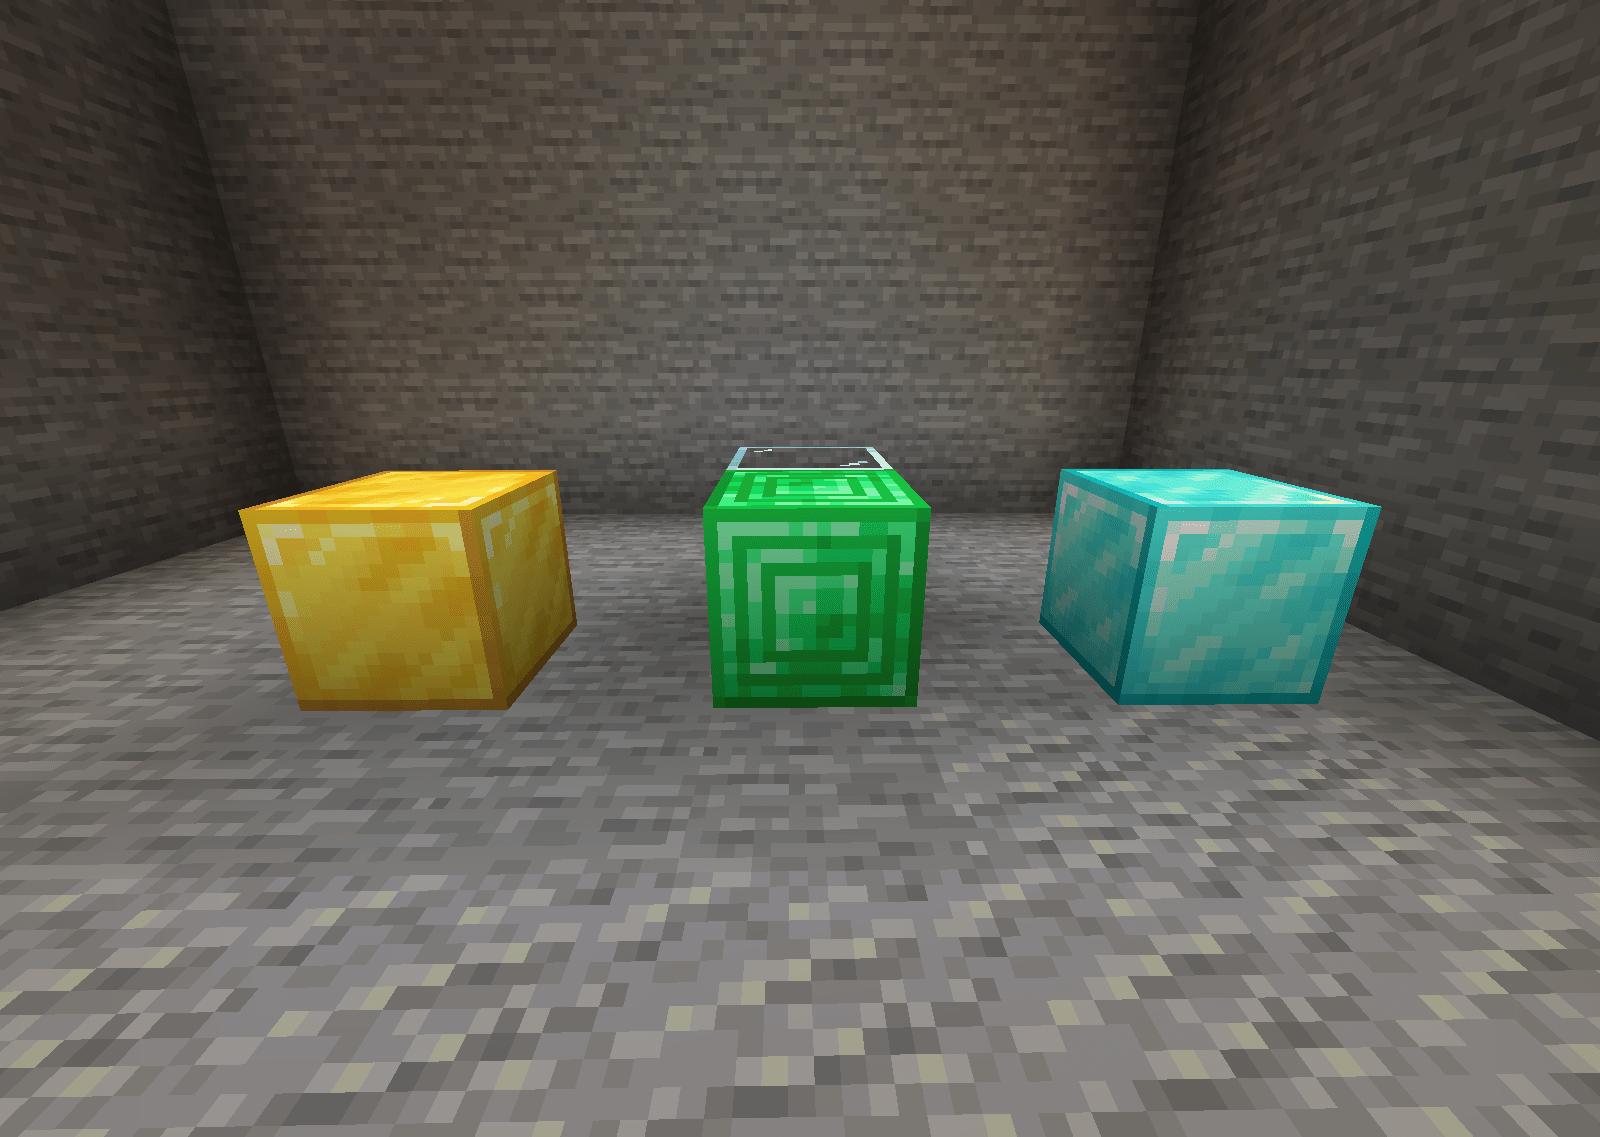 the emerald block texture